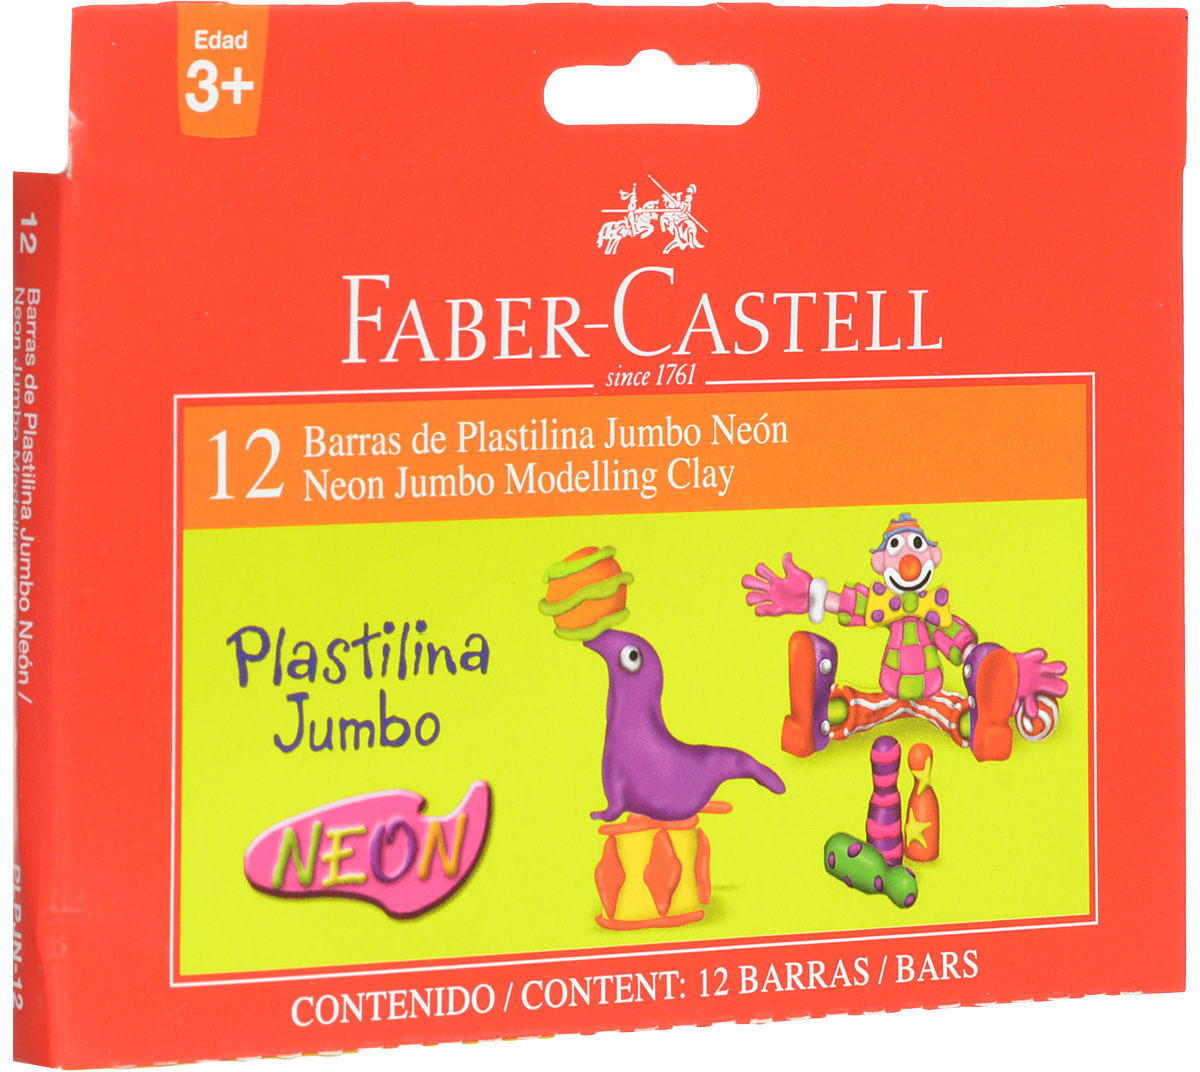 Faber-Castell Пластилин Neon Jumbo 6 цветов -  Пластилин